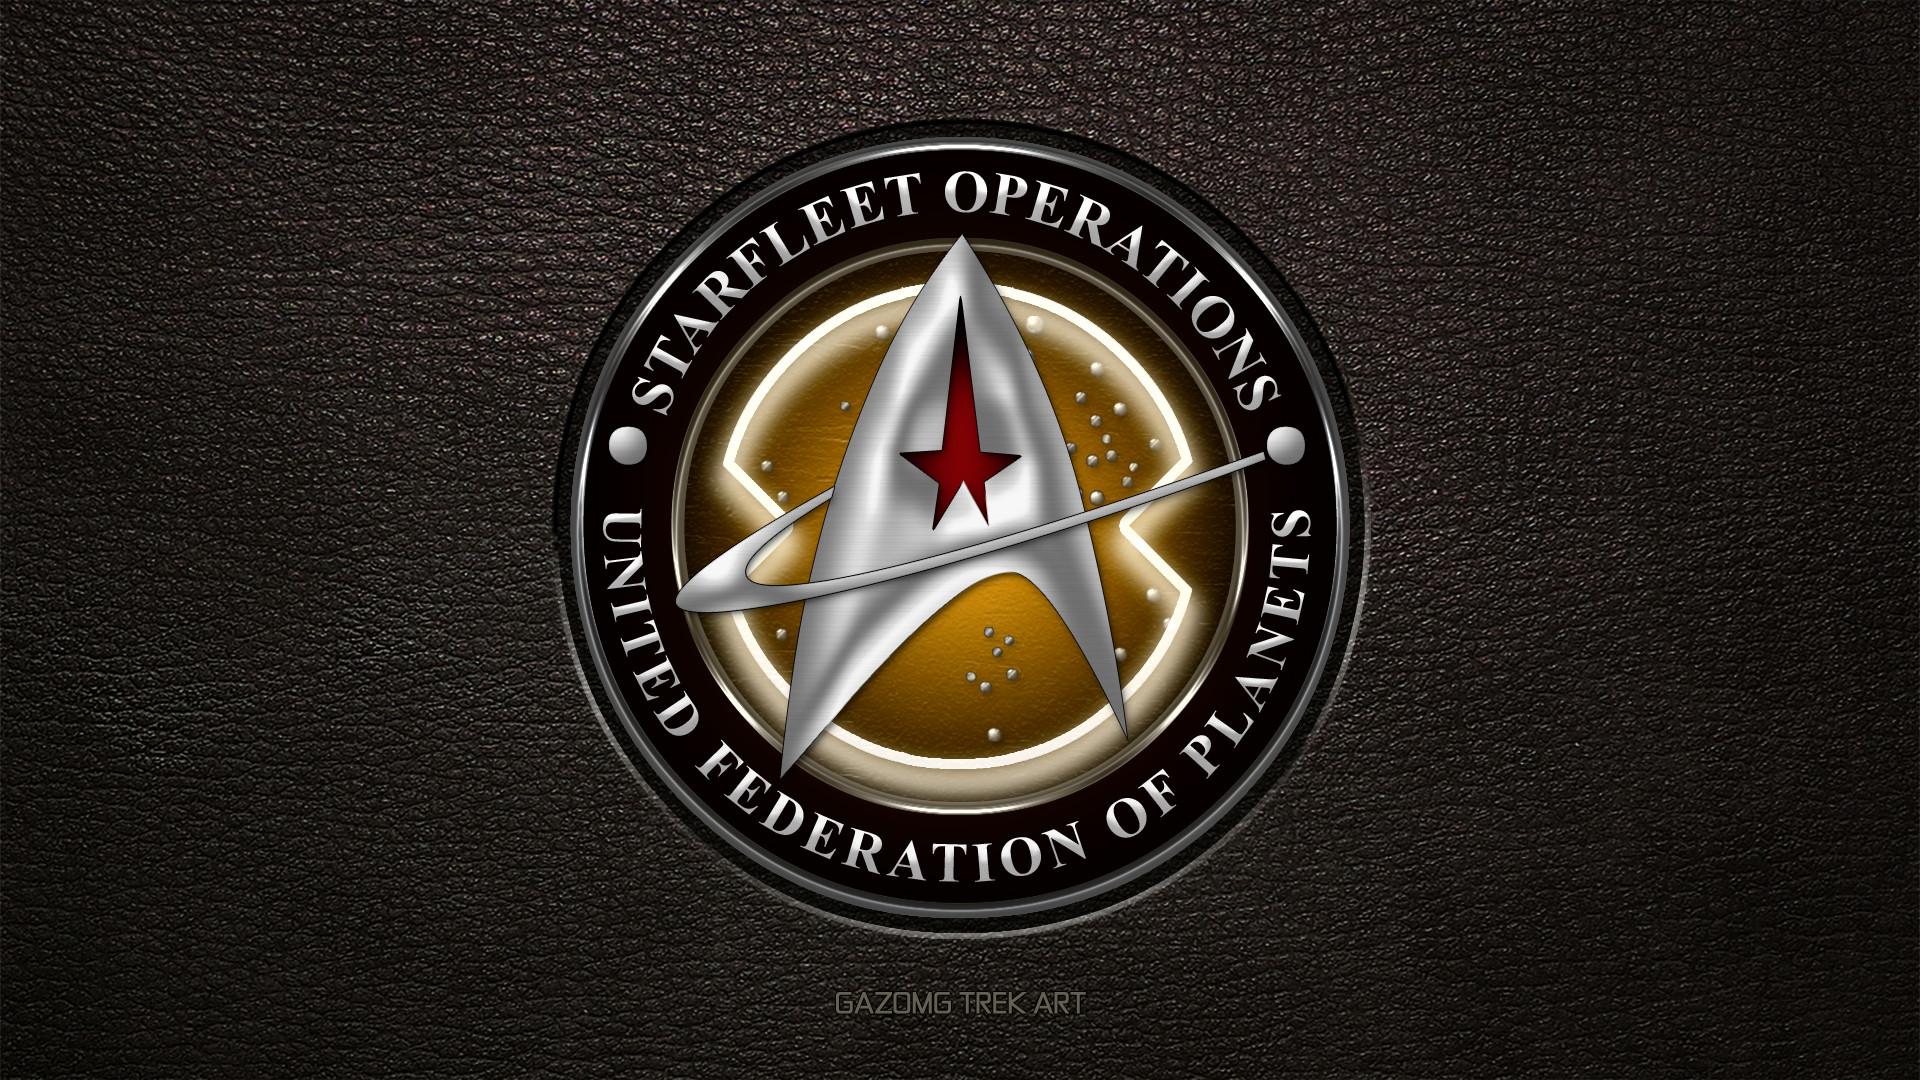 … Star Trek Starfleet Operations 24th Century Logo by gazomg